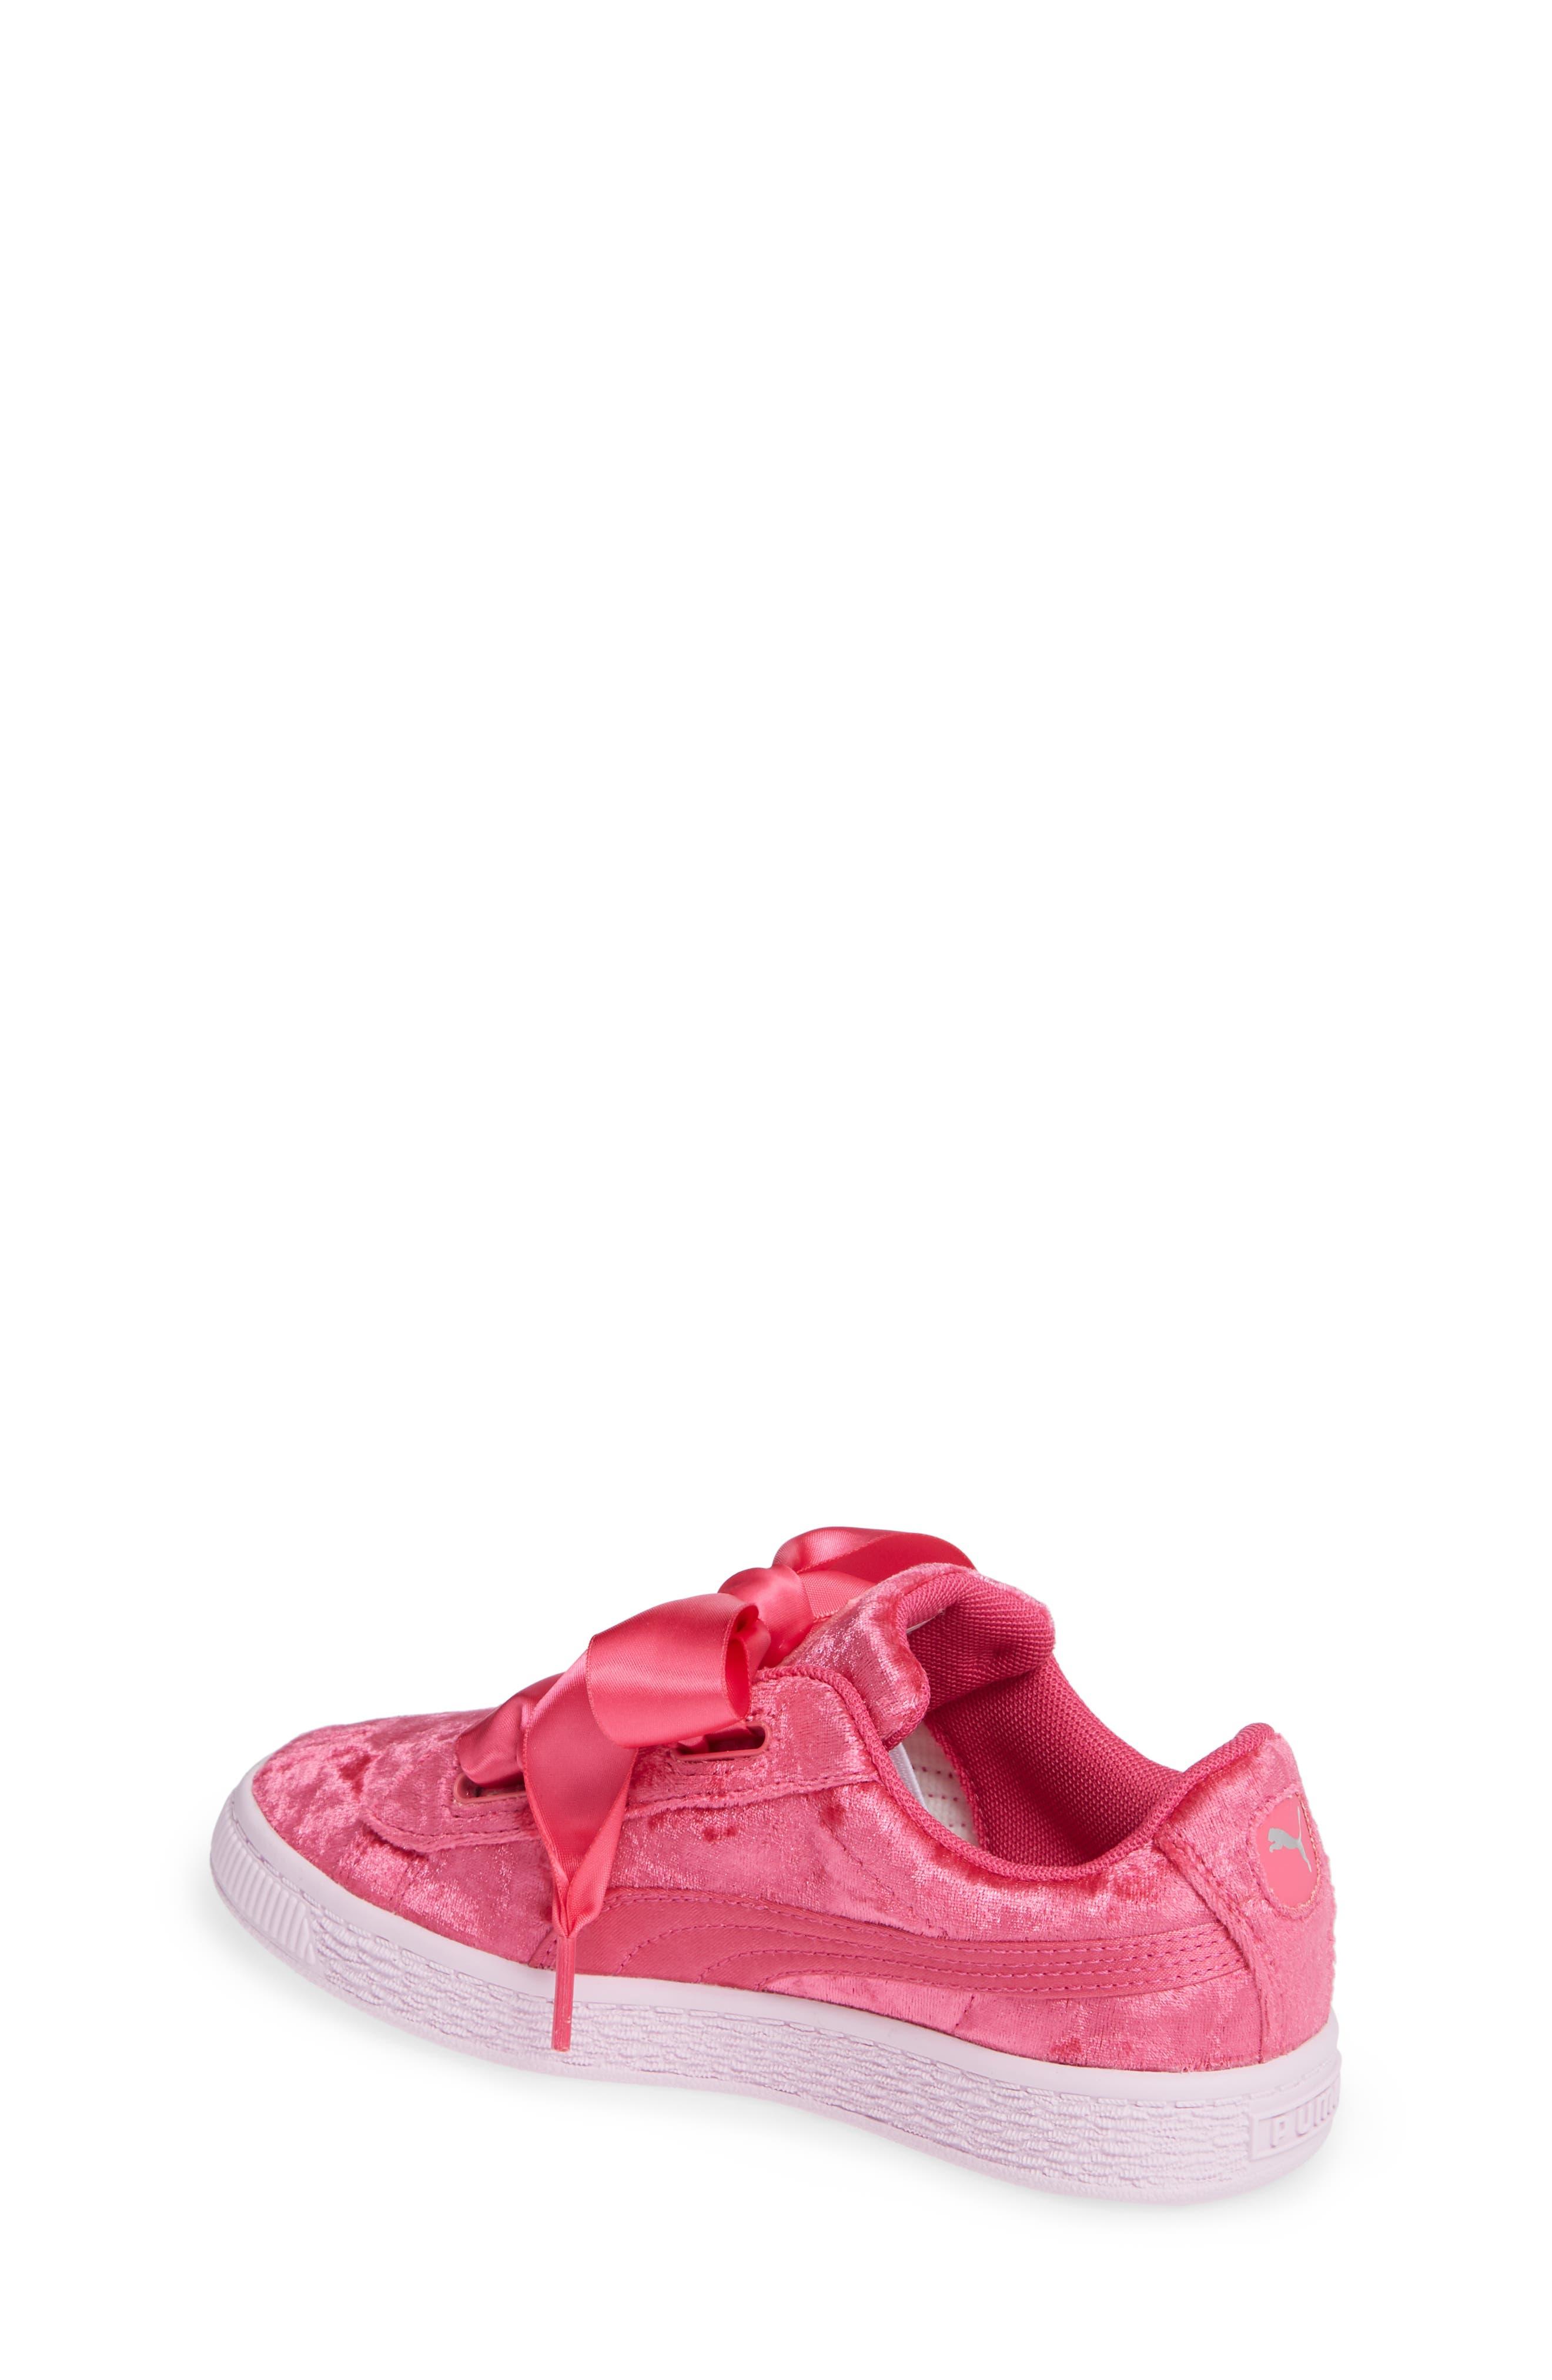 Basket Heart Sneaker,                             Alternate thumbnail 2, color,                             BEETROOT PURPLE-PUMA SILVER